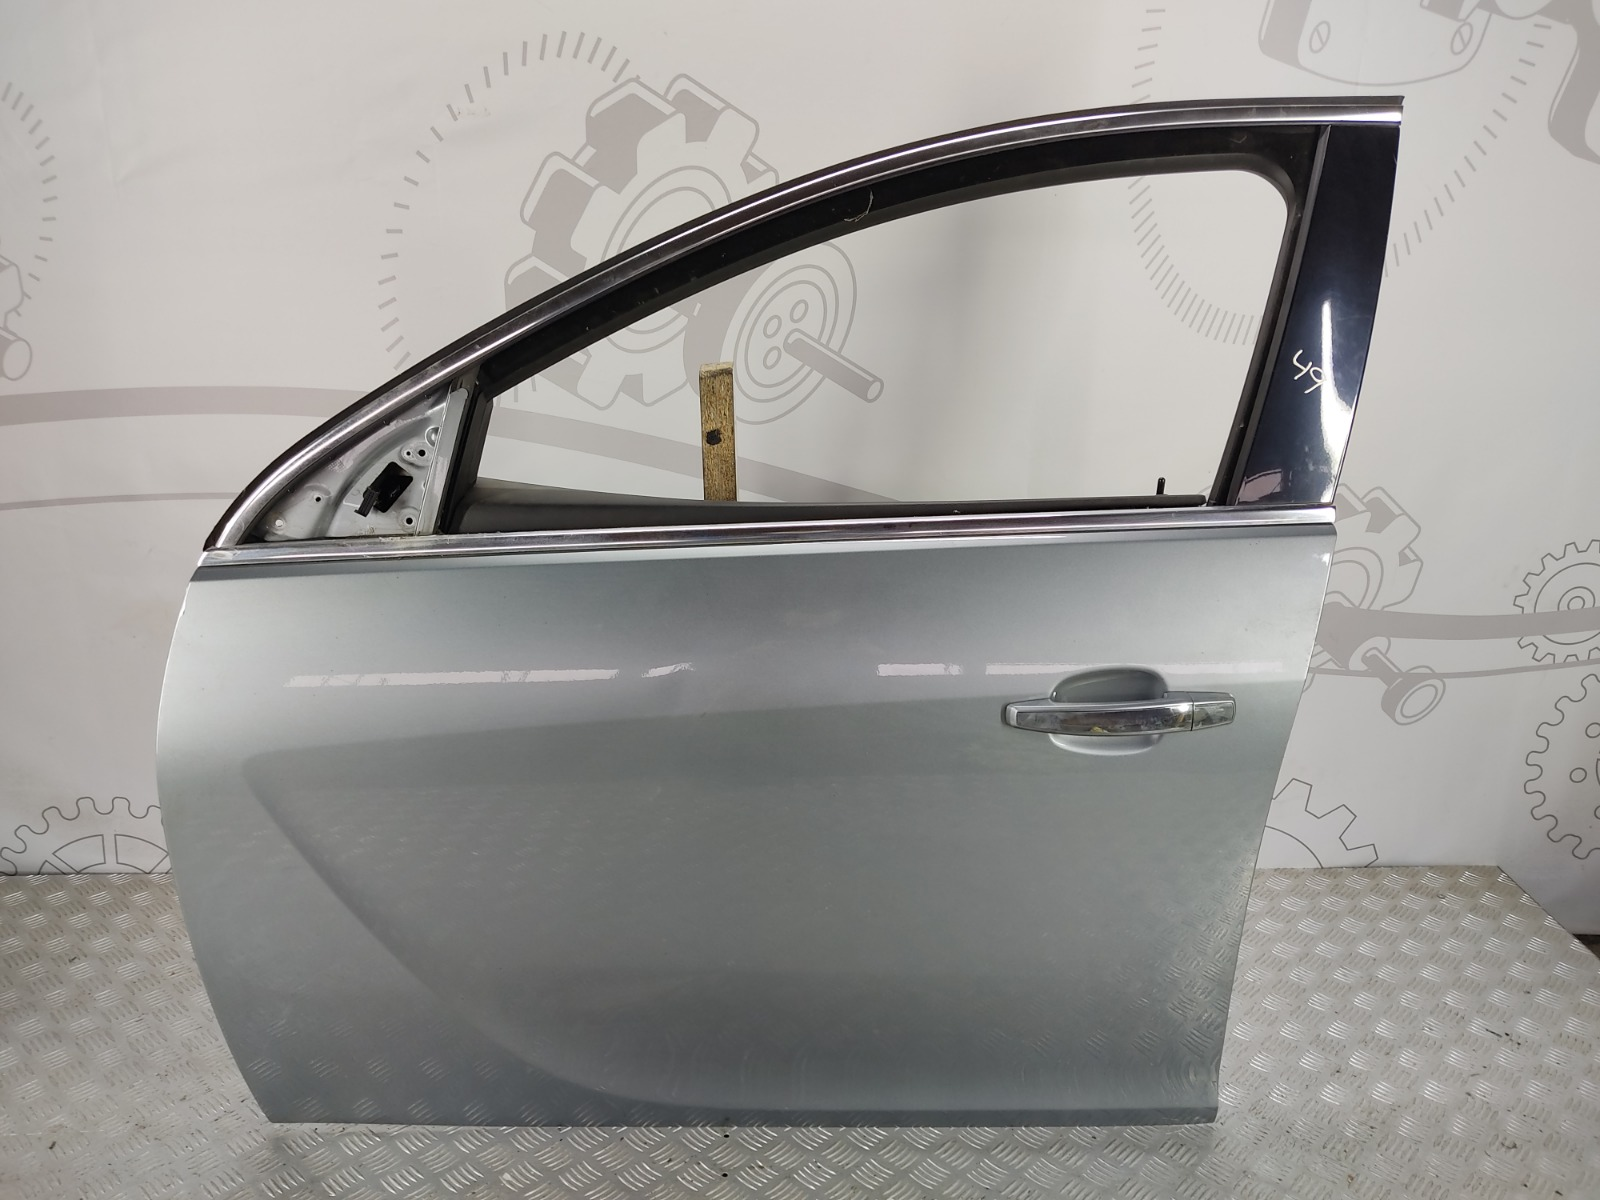 Дверь передняя левая Opel Insignia 2.0 CDTI 2010 (б/у)